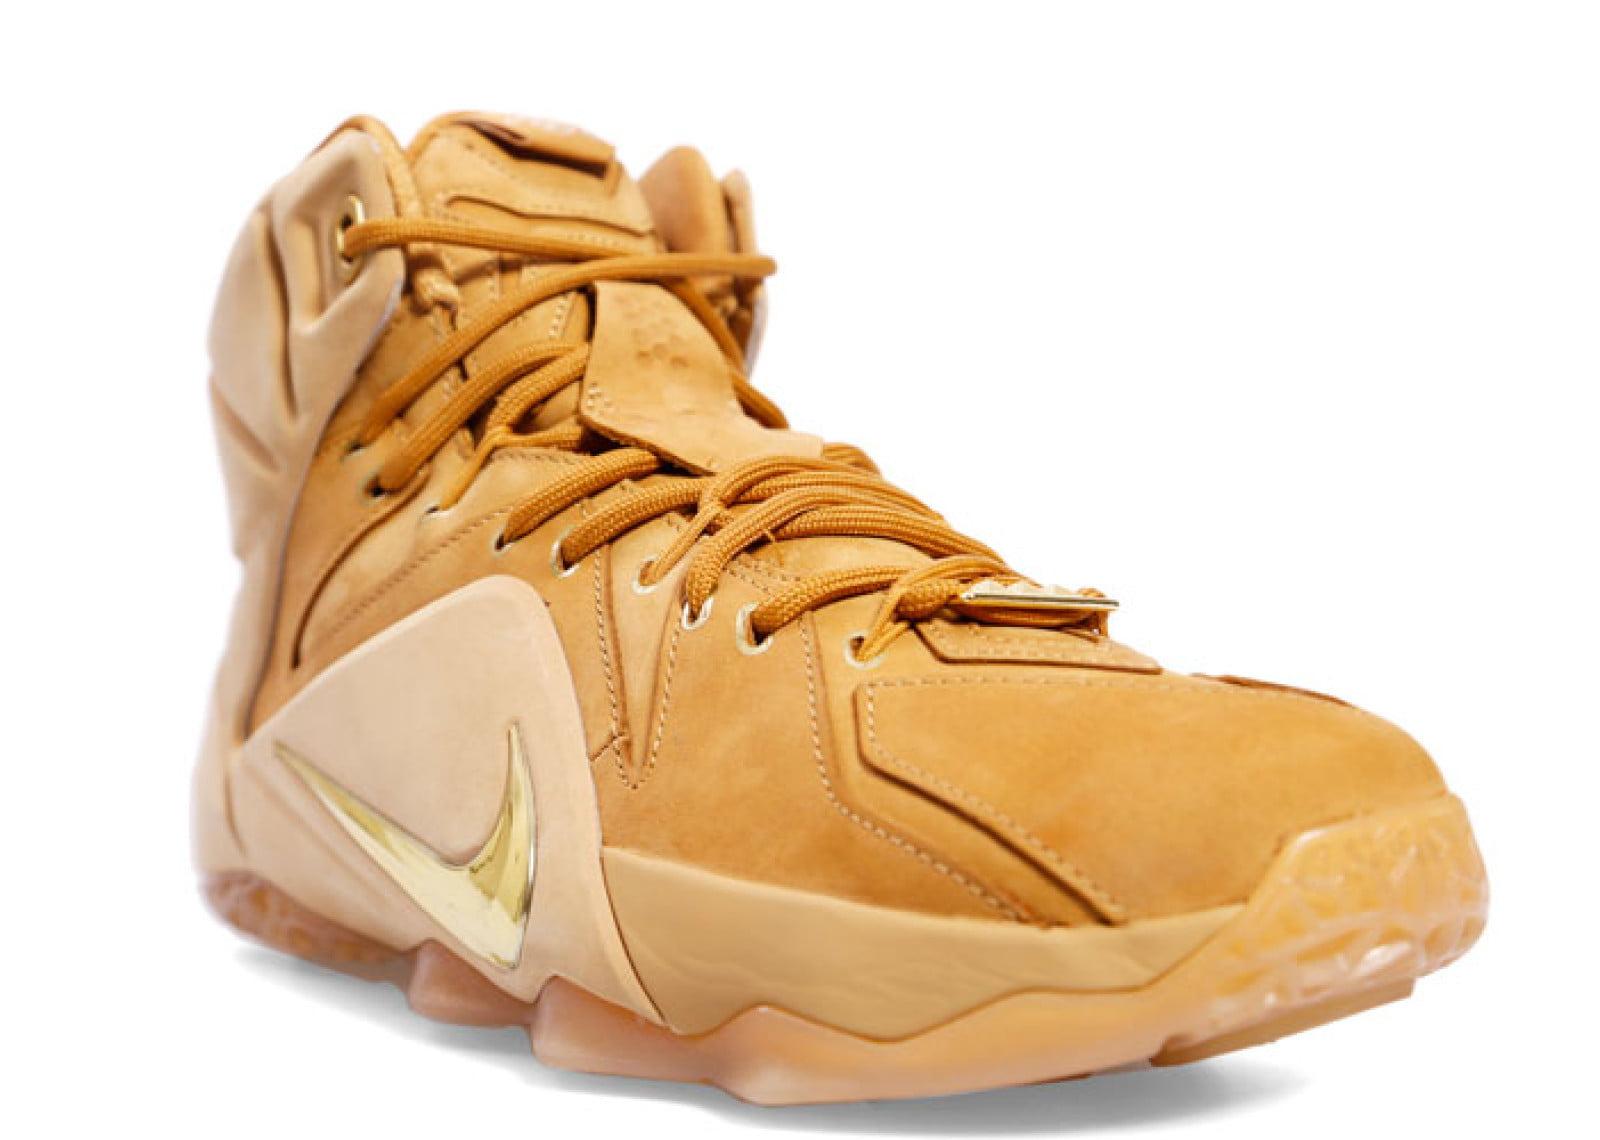 Nike - Men - Lebron 12 Ext 'Wheat